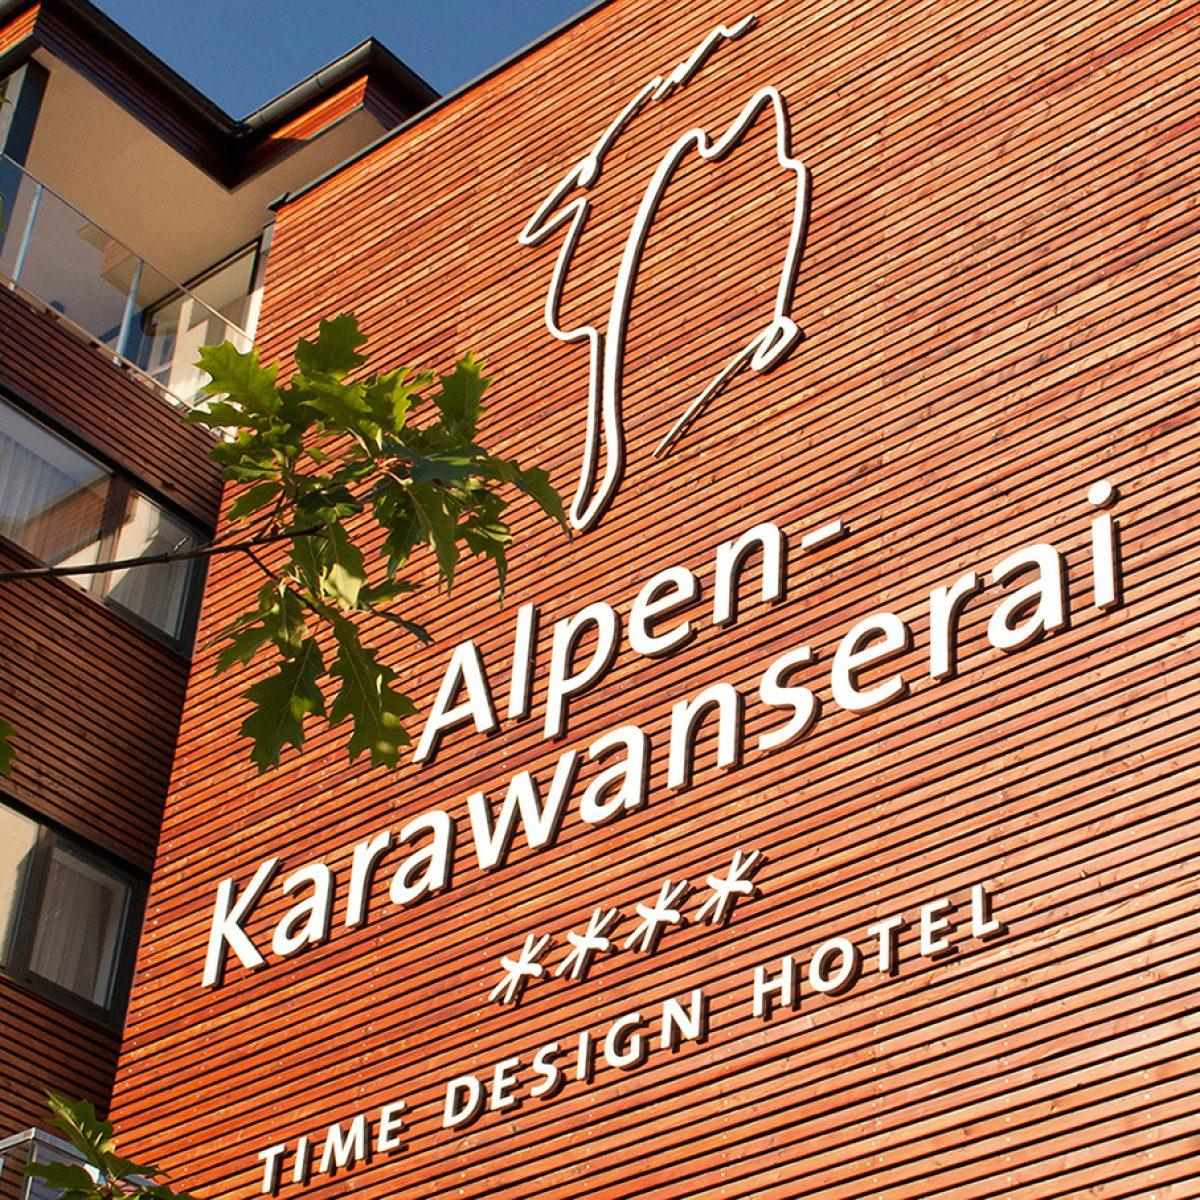 Salzburger Land: 3 Nächte - 4*S Hotel Alpen-Karawanserai - Superior-Doppelzimmer inkl. Frühstück, 2000m² Spa Nutzung u.v.m. / gratis Storno